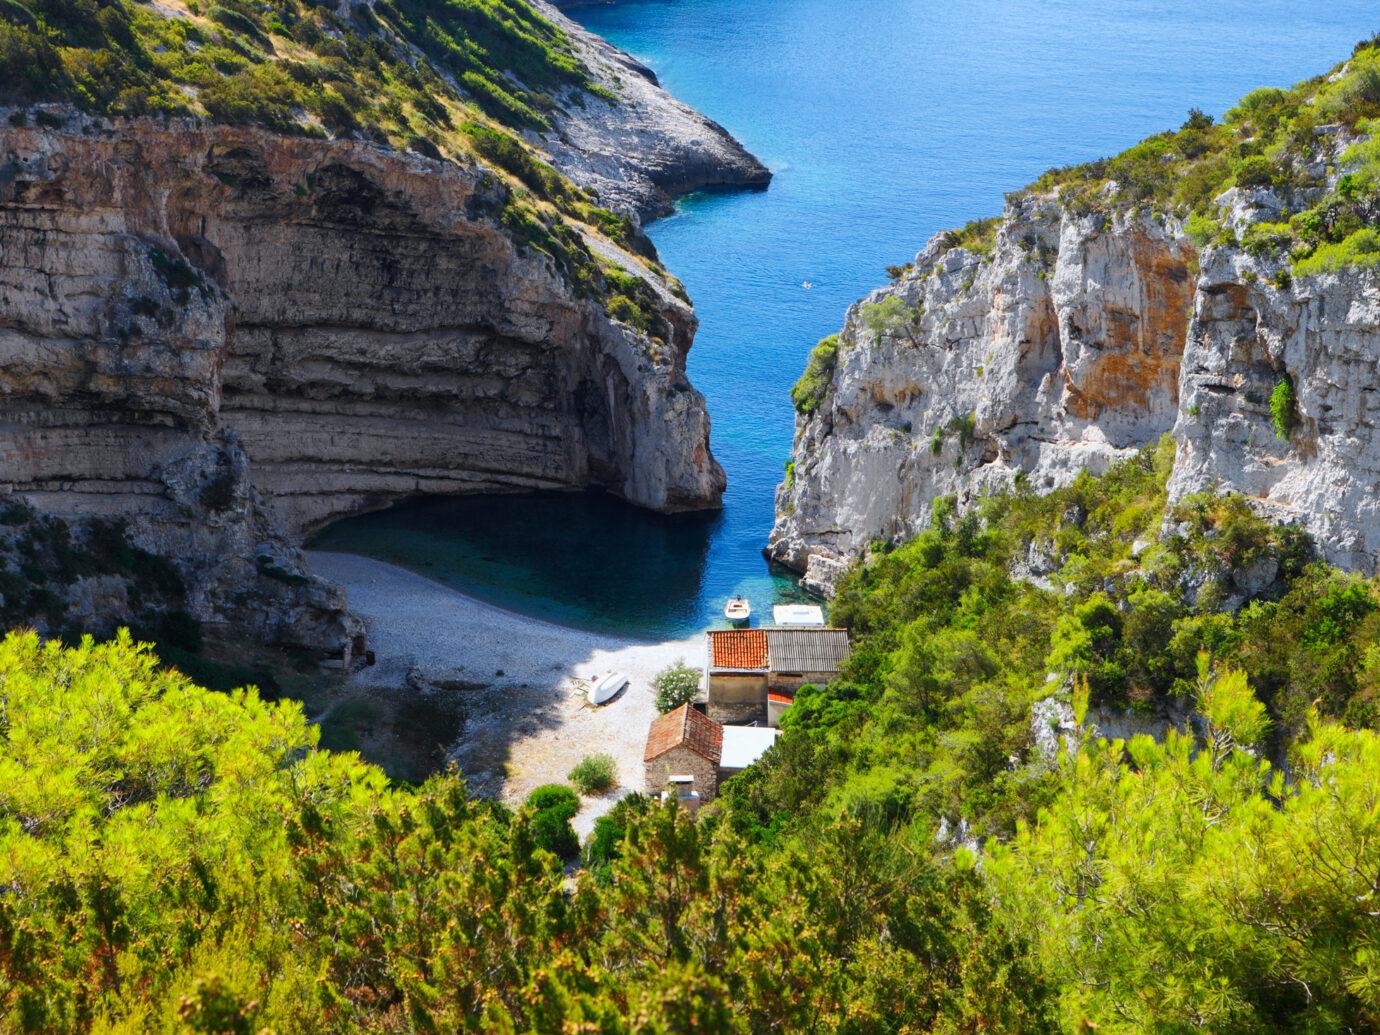 BEach on the Island of Vis, Croatia